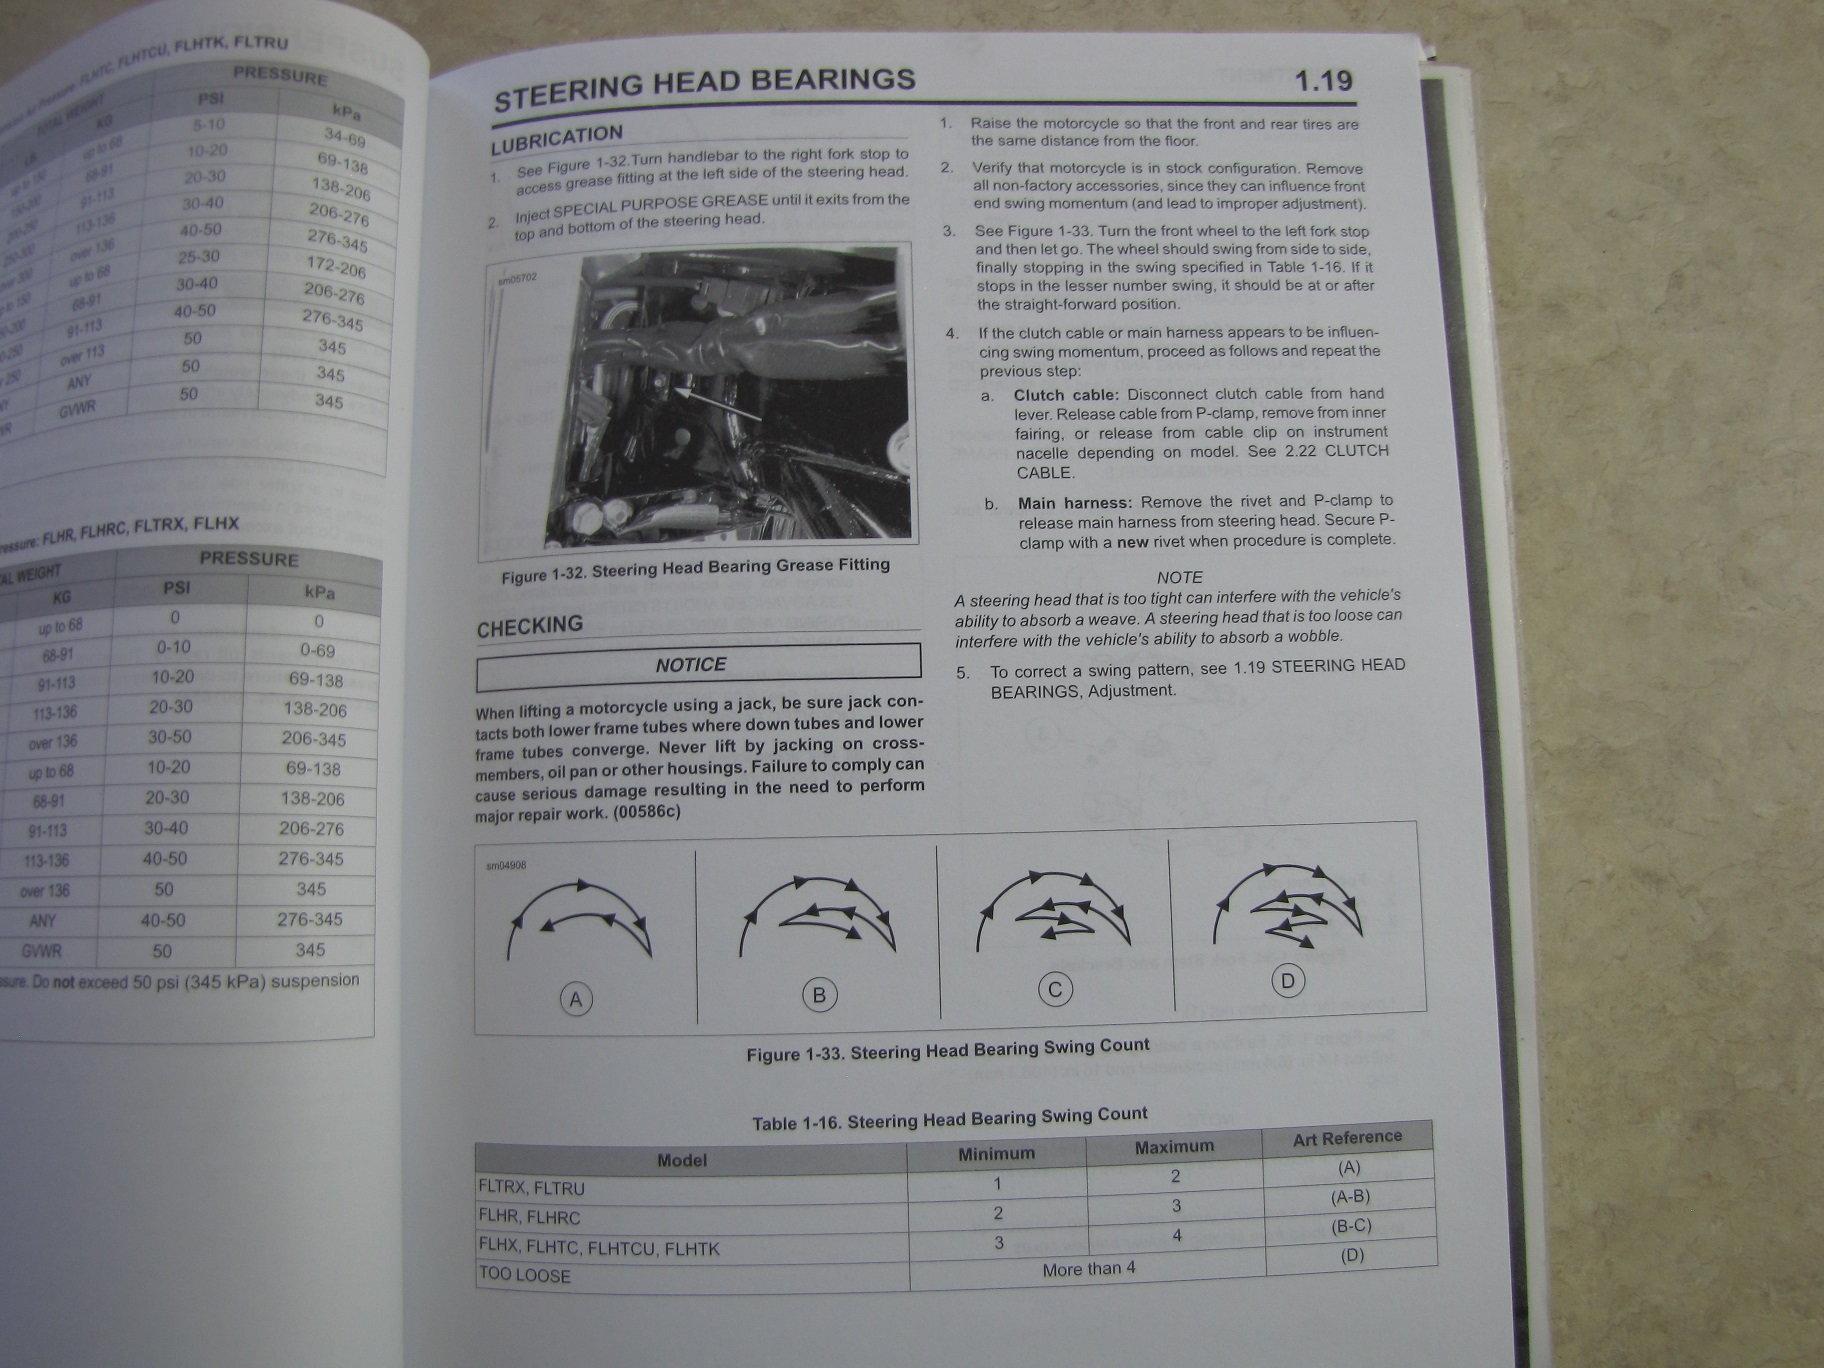 Steering Head Bearing Adjustment Tool - Page 2 - Harley